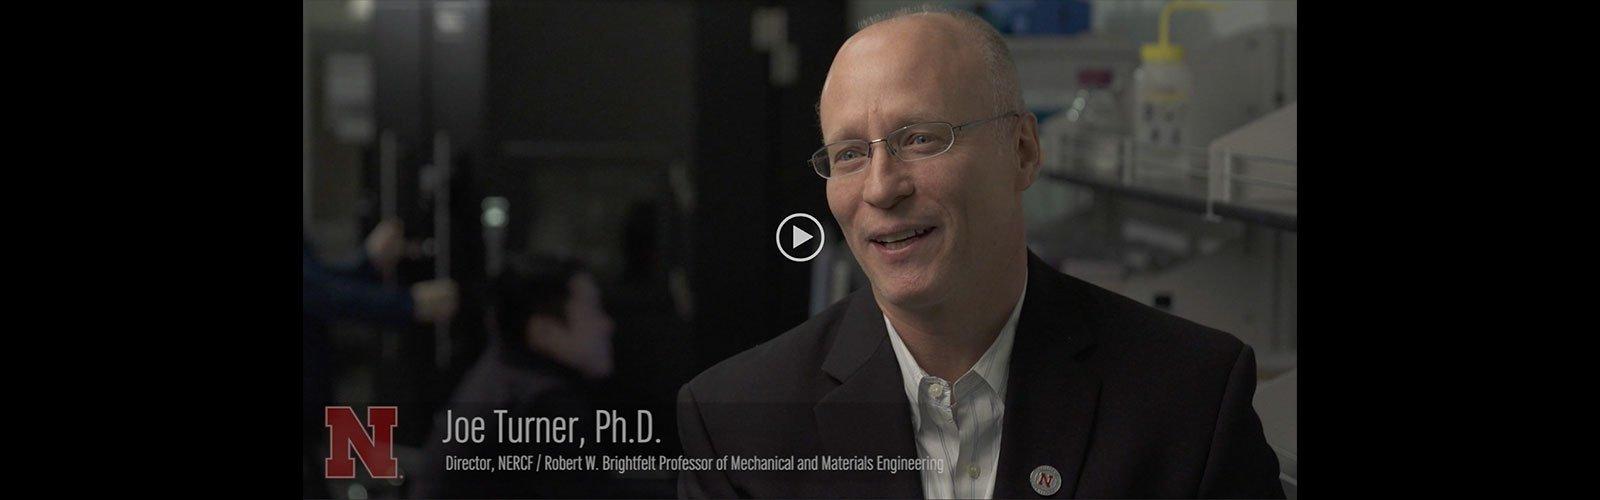 Joe Turner, Ph.D. - Director, NERCF / Robert W. Brightfeld Professor of Mechanical and Materials Engineering